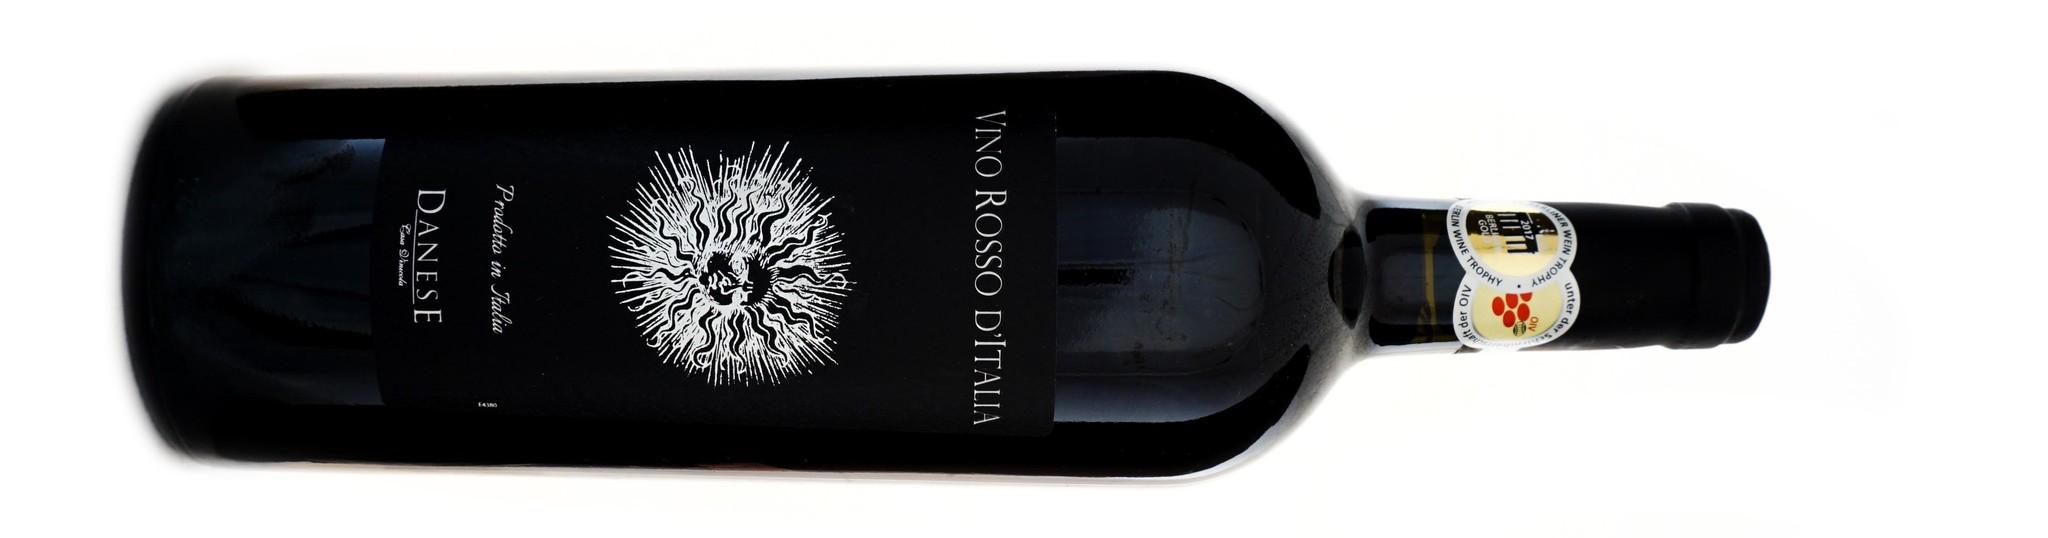 Danese Vino Rosso